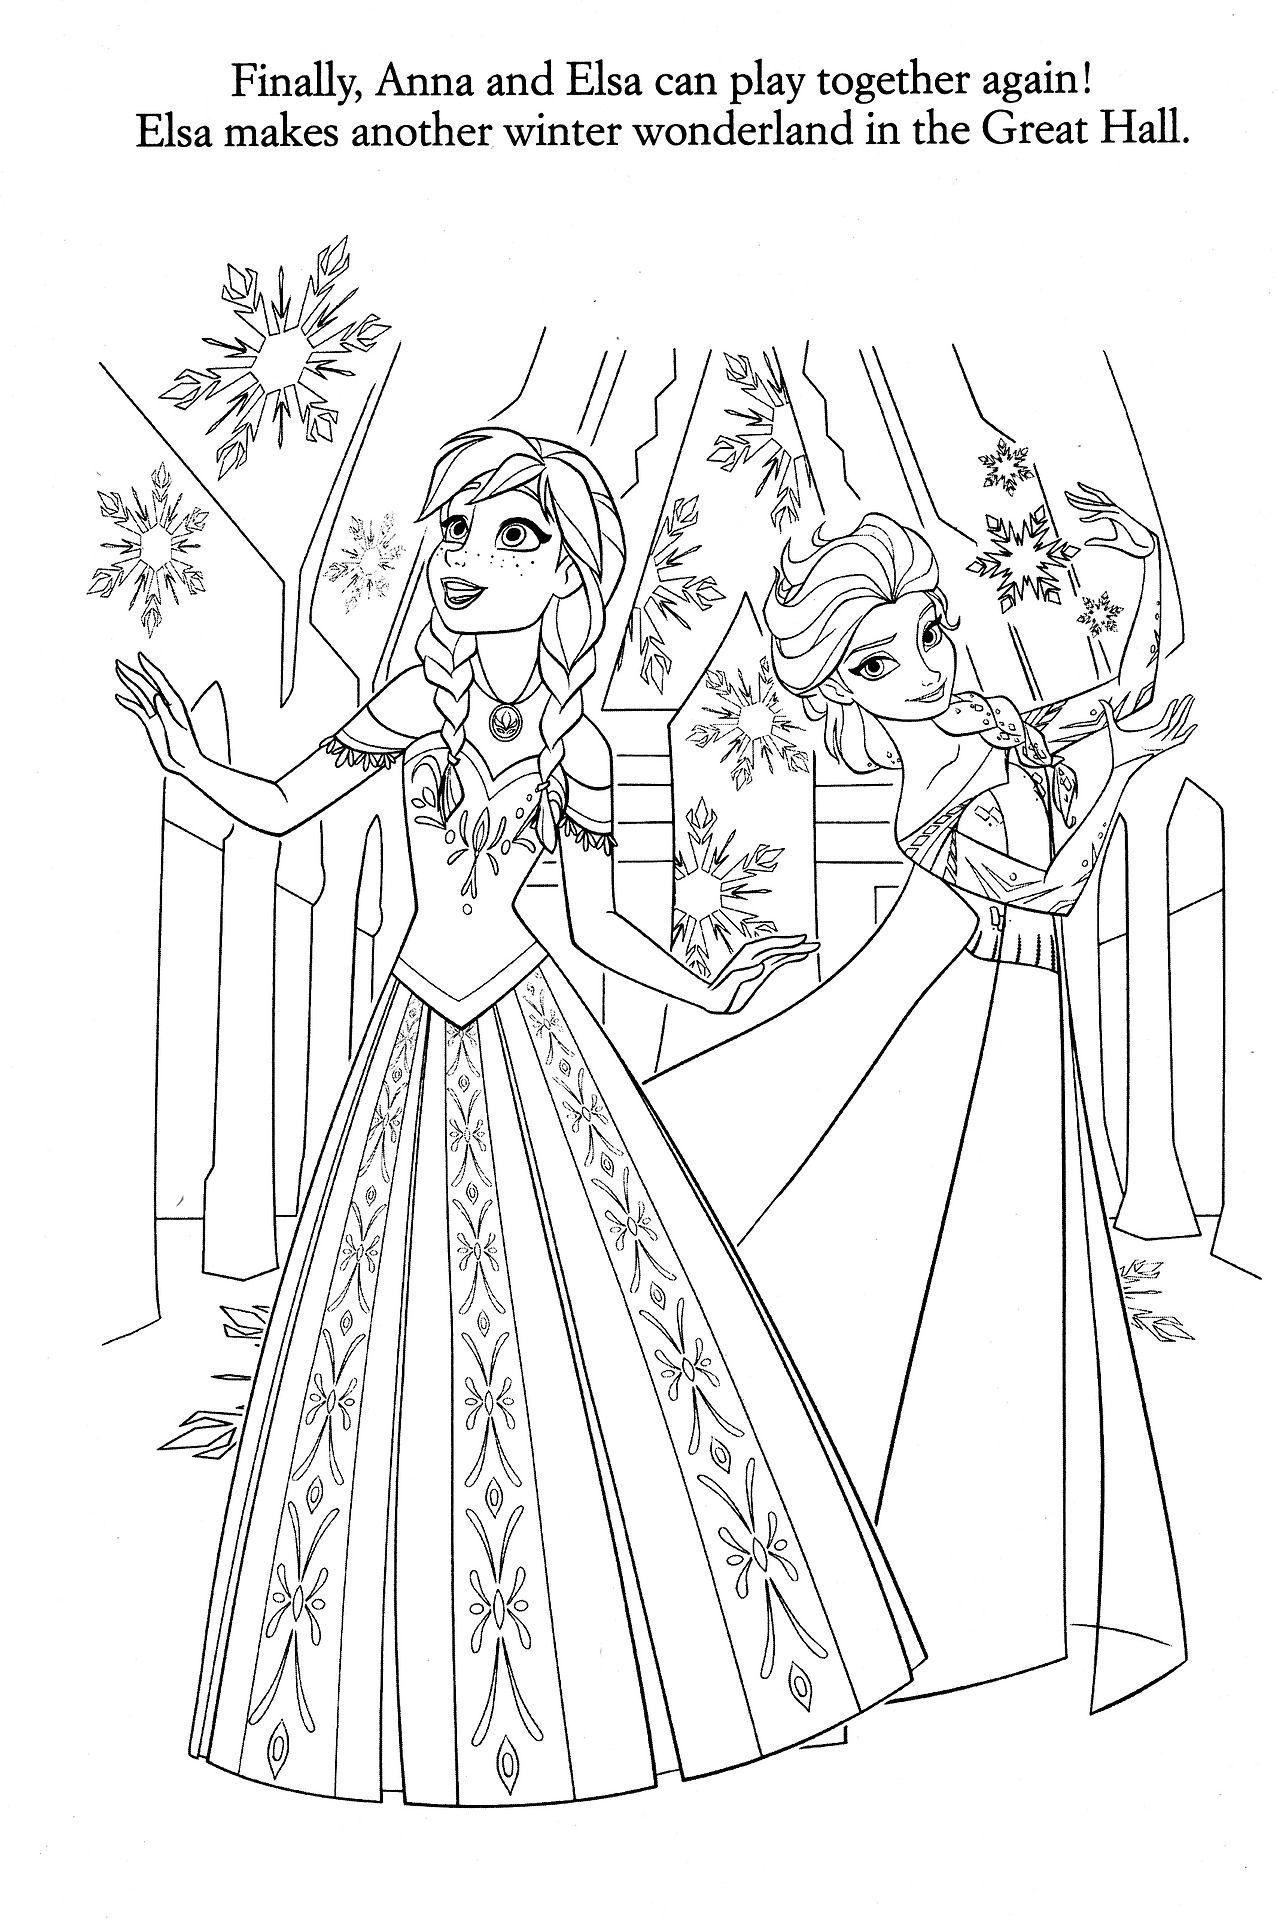 Disney Coloring Pages Elsa Coloring Pages Disney Princess Coloring Pages Frozen Coloring Pages